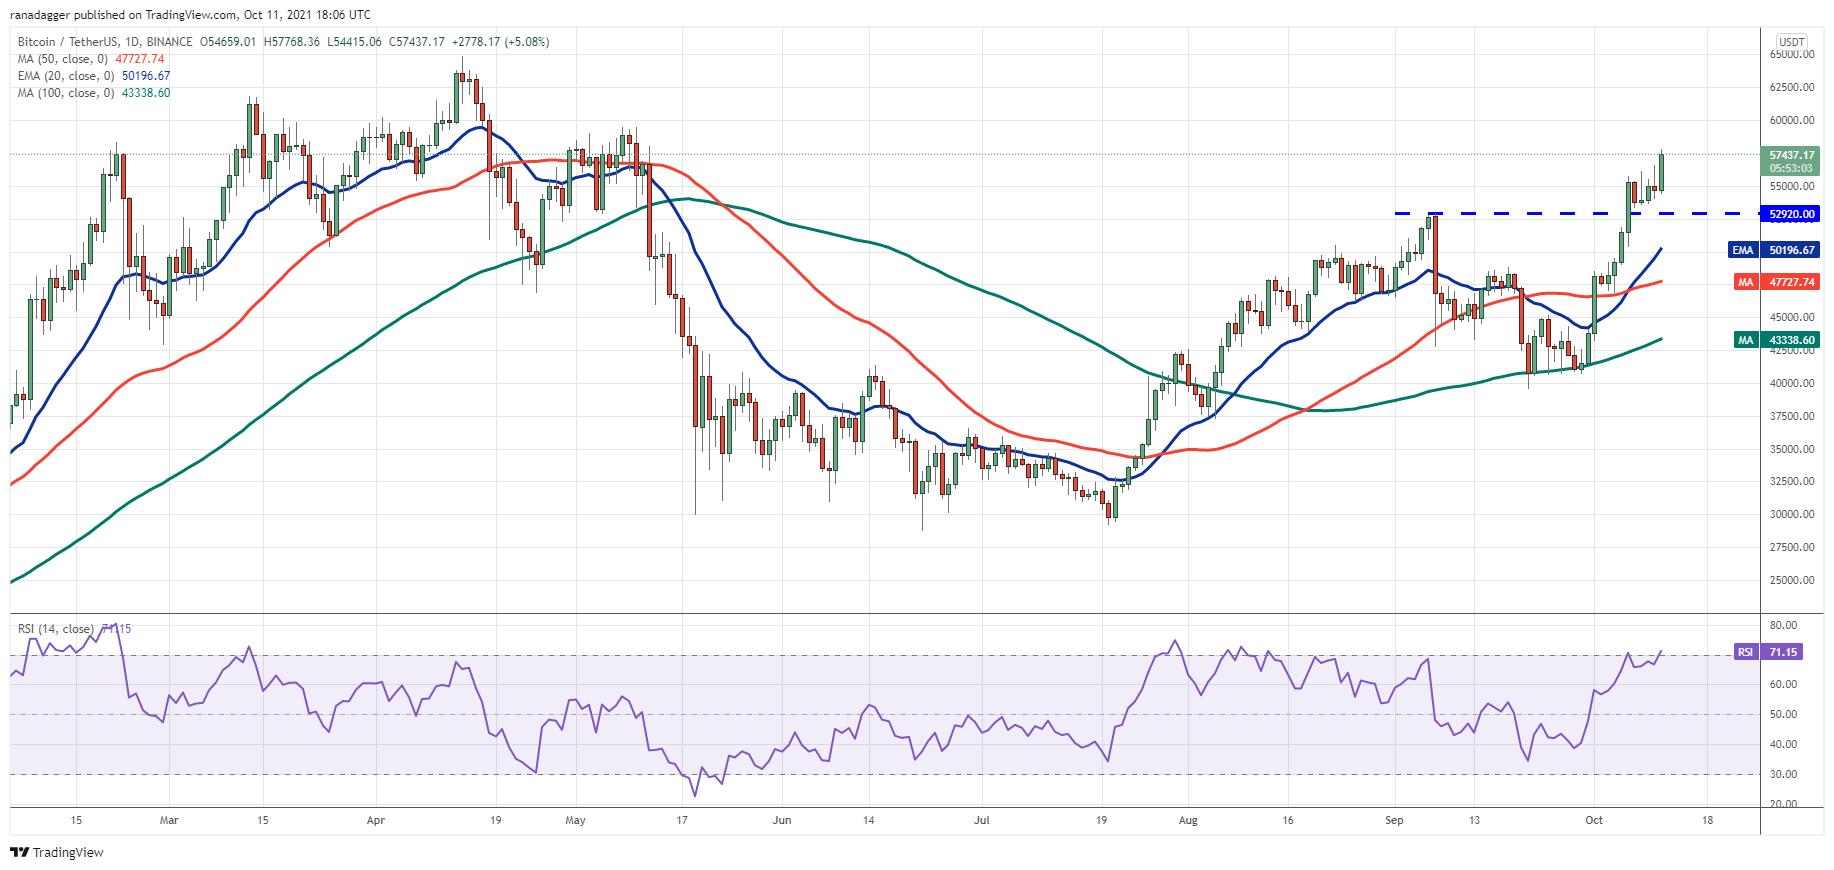 Price analysis 10/11: BTC, ETH, BNB, ADA, XRP, SOL, DOGE, DOT, LUNA, UNI2